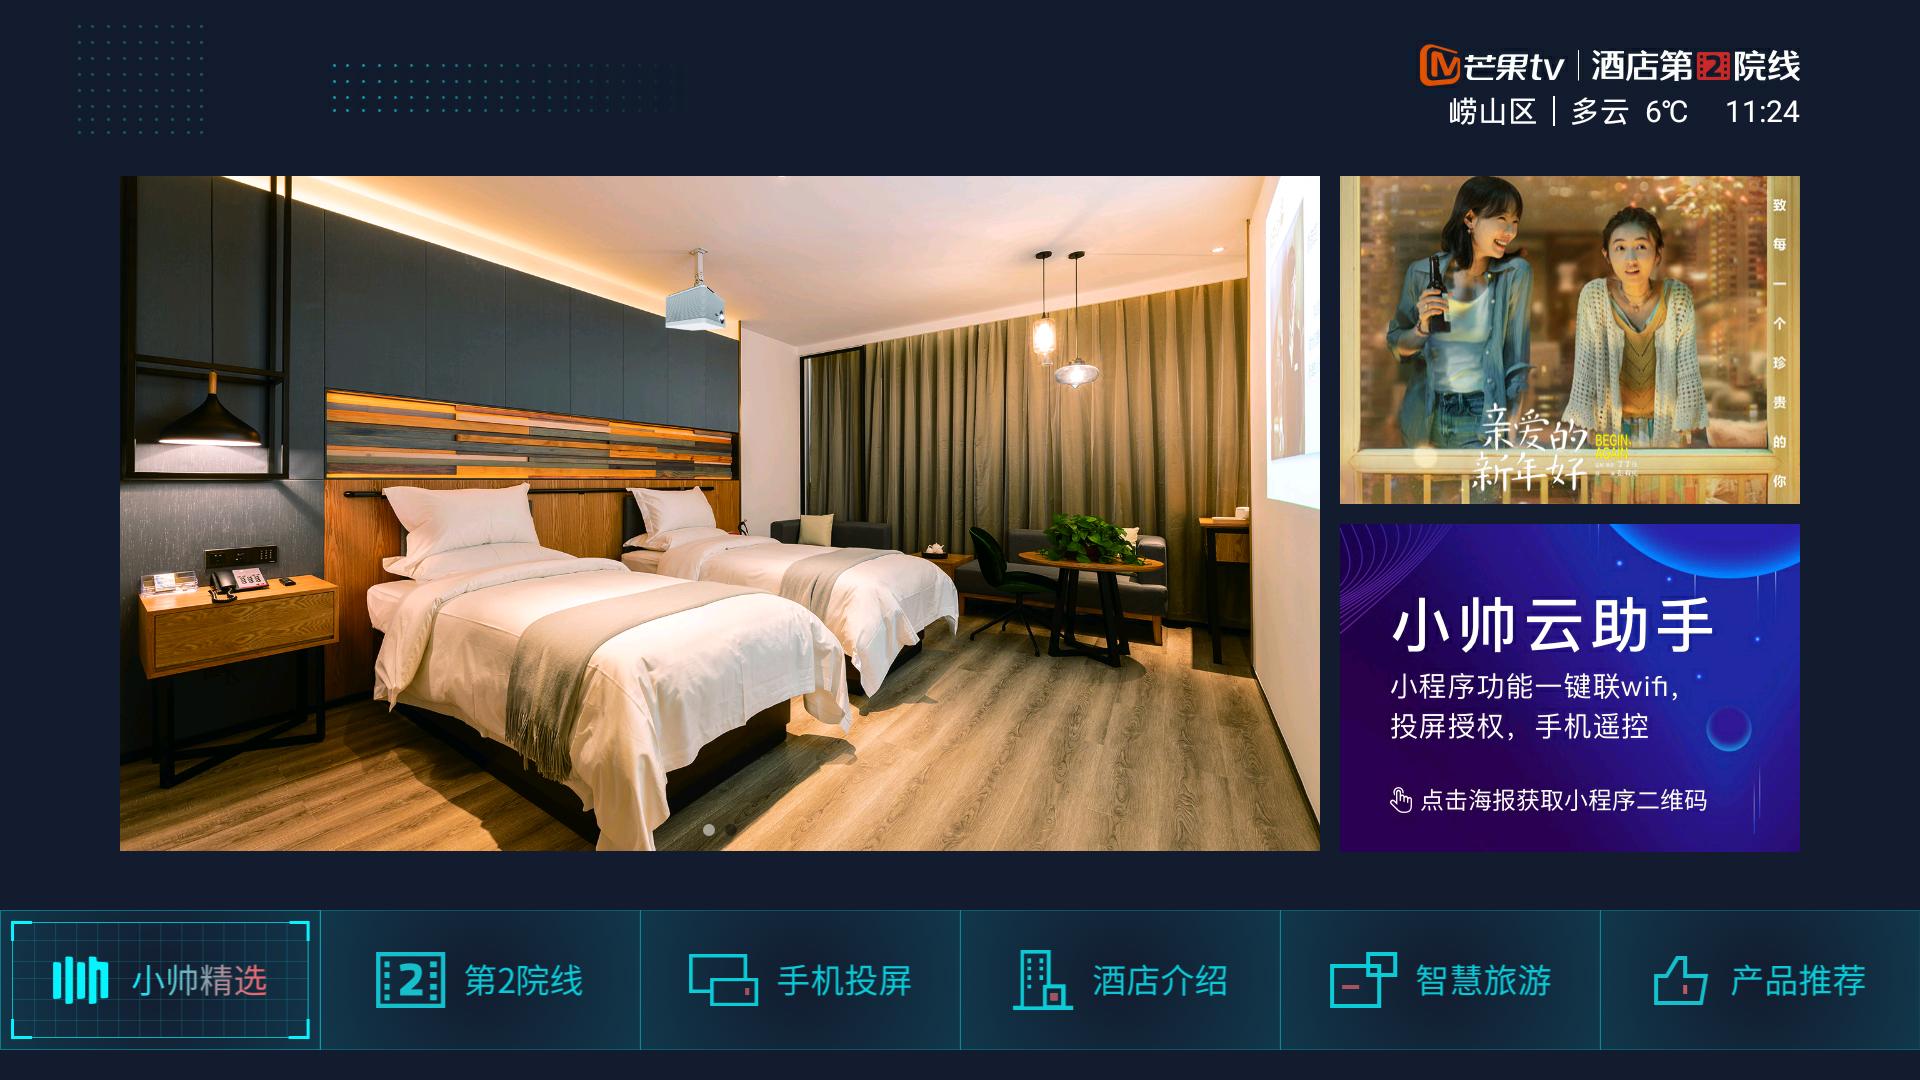 新版UI界面展示.png